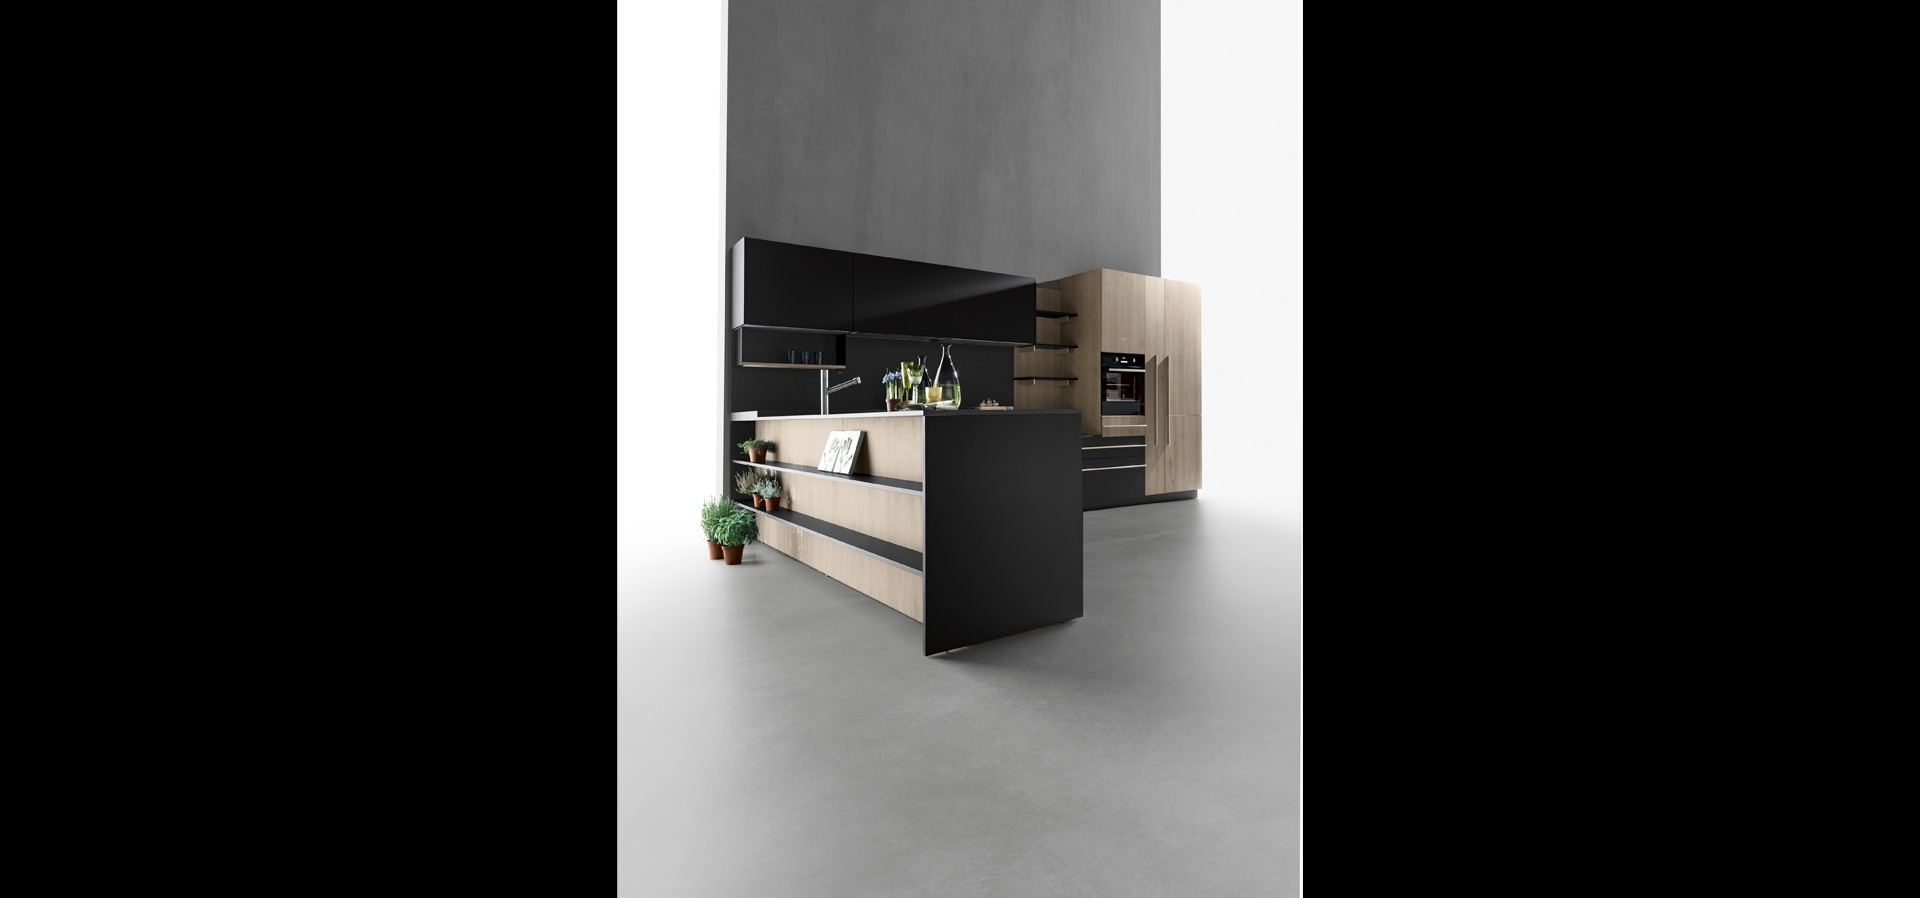 Cucina moderna in legno | Sincro Wood | MITON Cucine